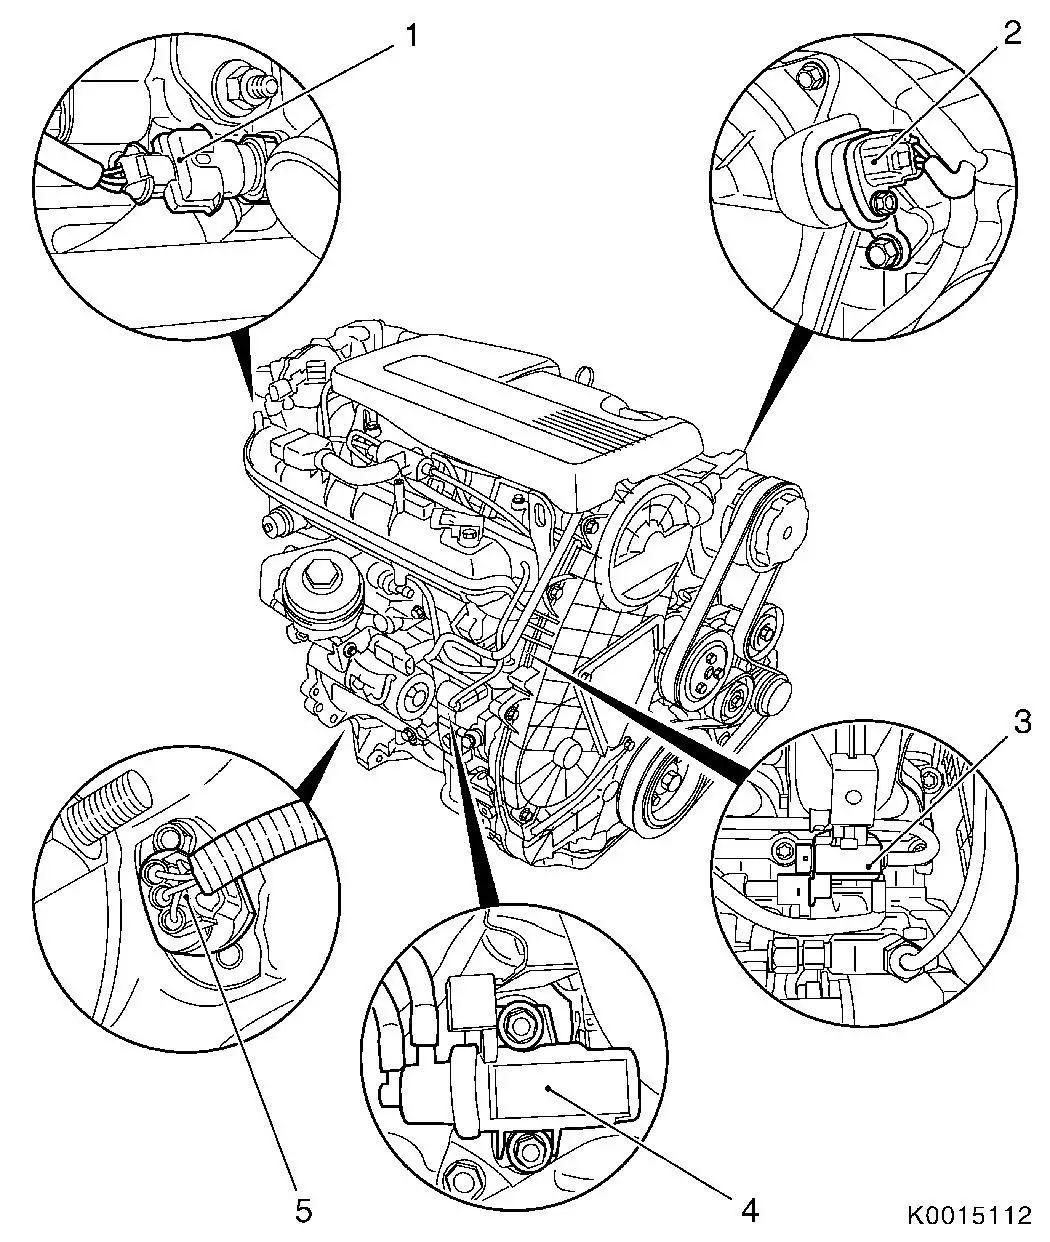 opel corsa engine diagram manual